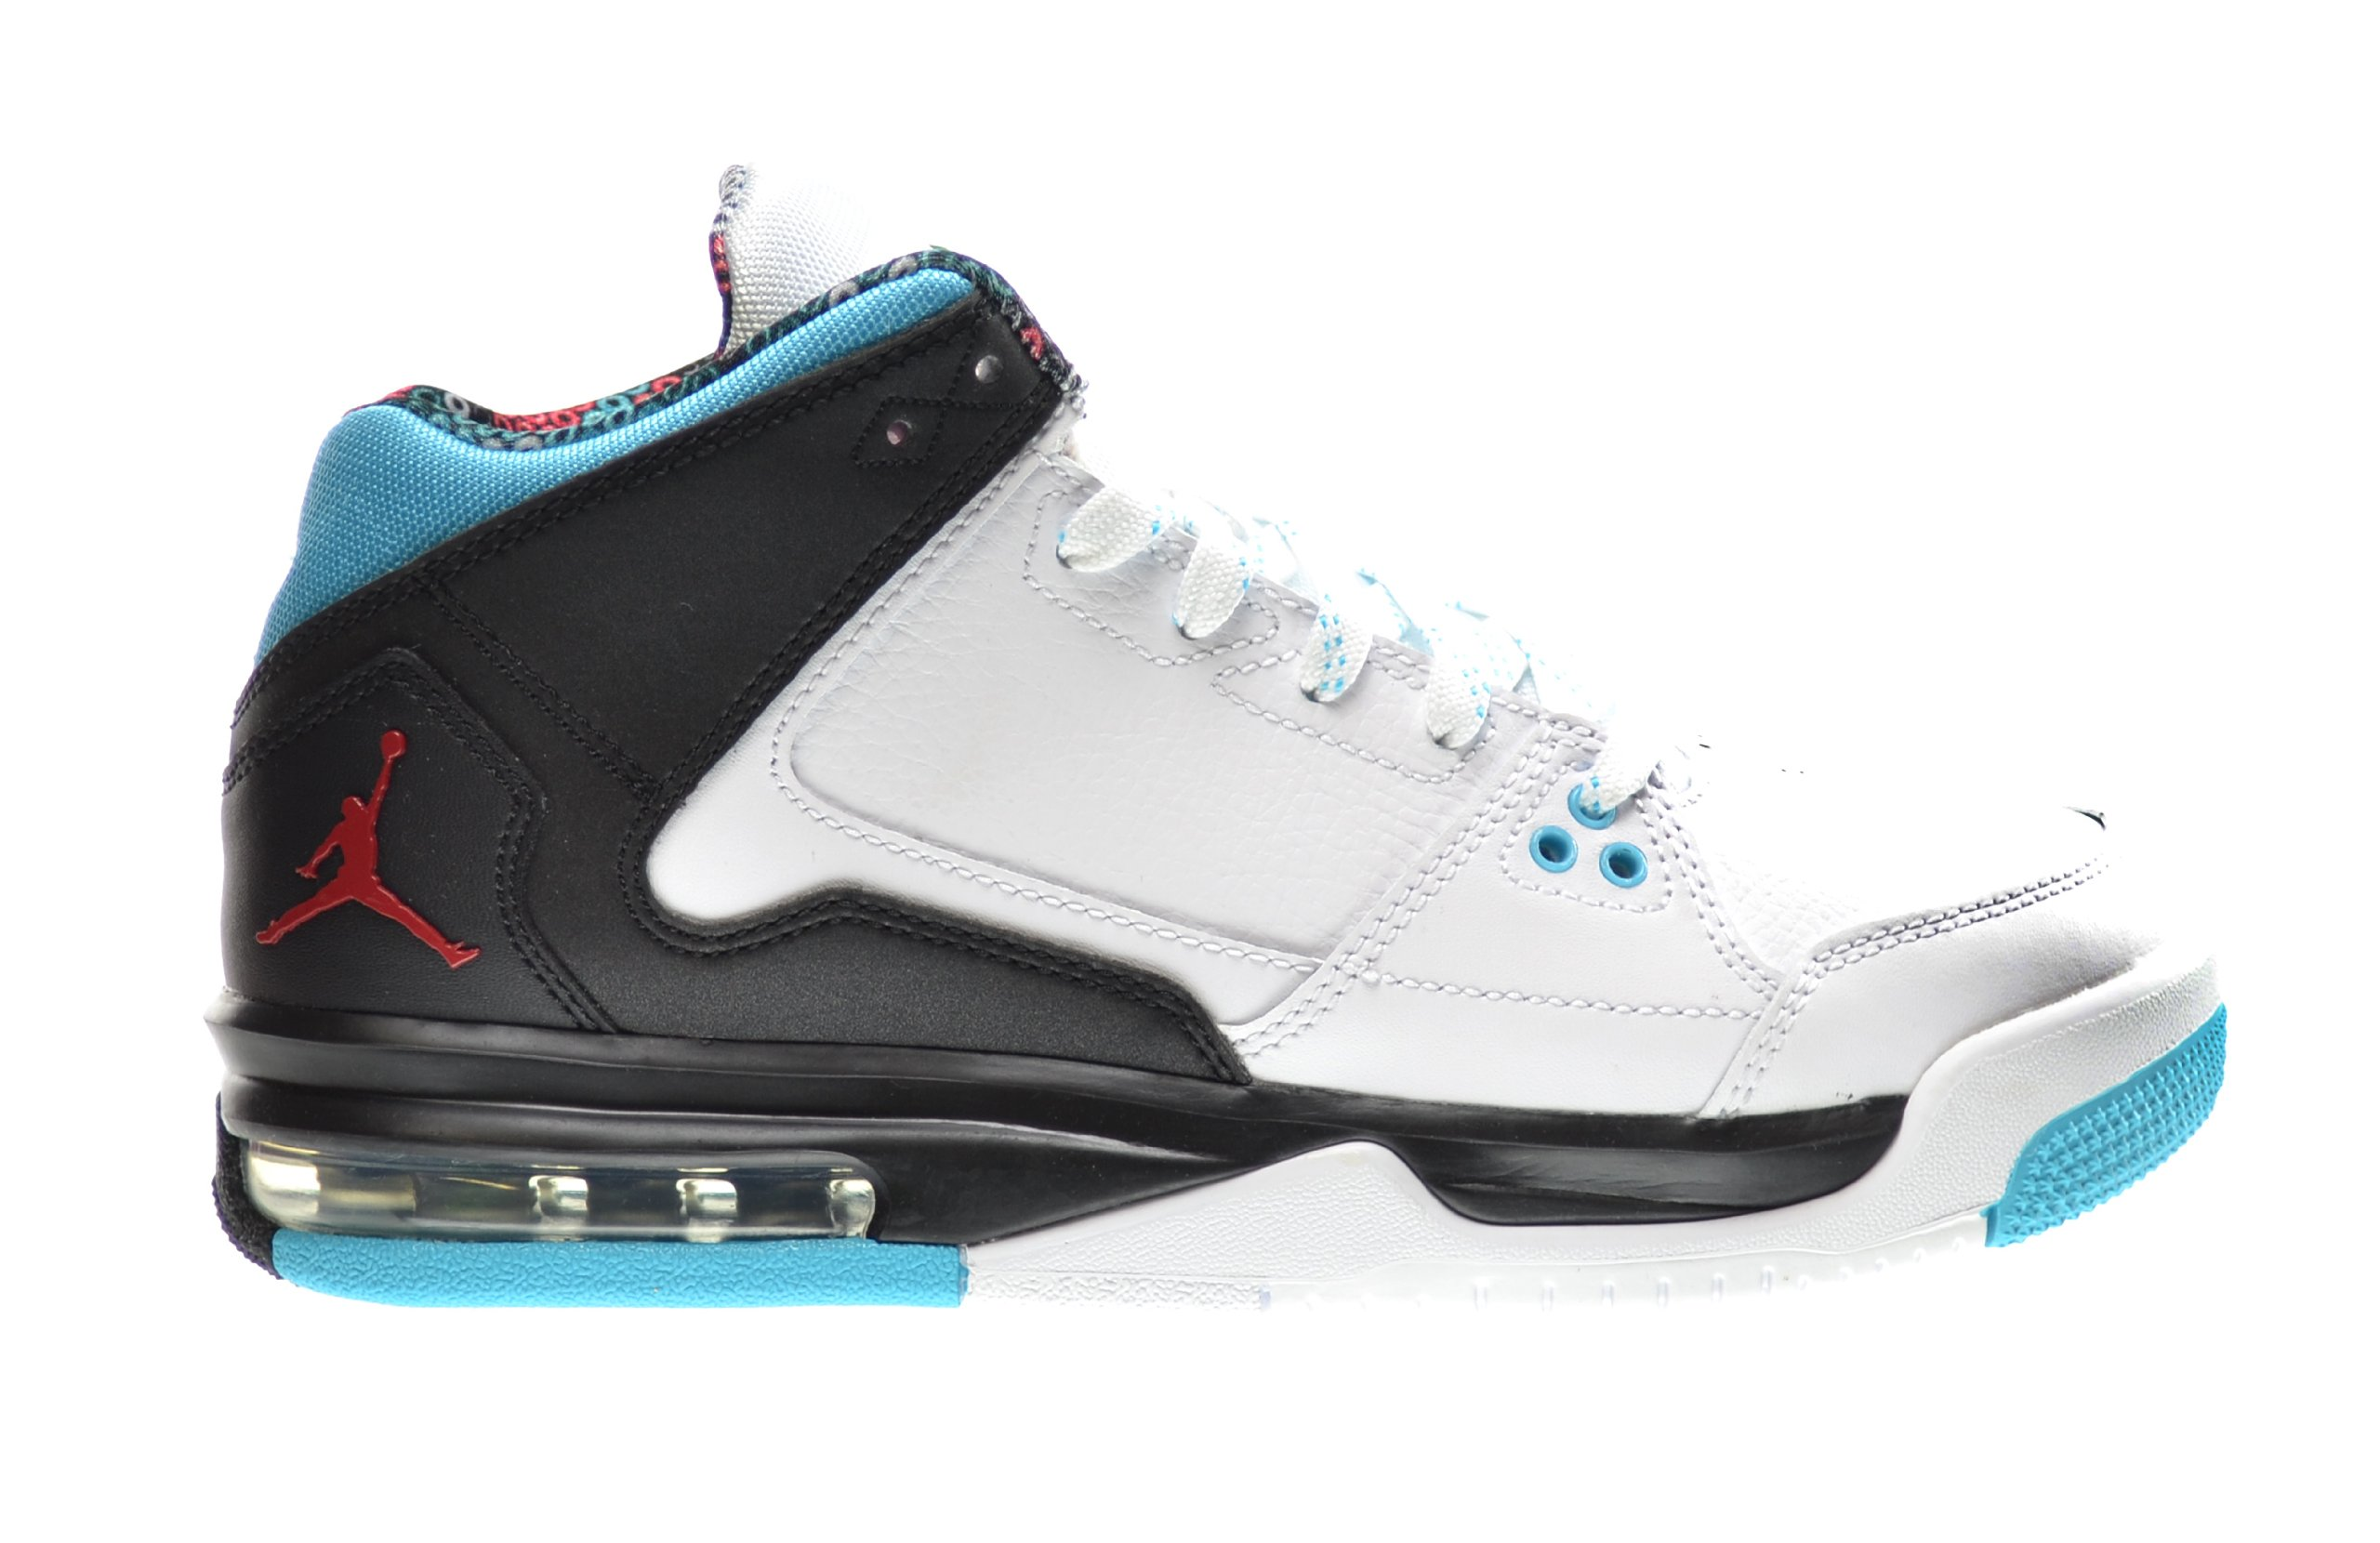 a967f3ead268cc jordan flight origin gs Air jordan retro gg big kids shoes white sunblush  black.